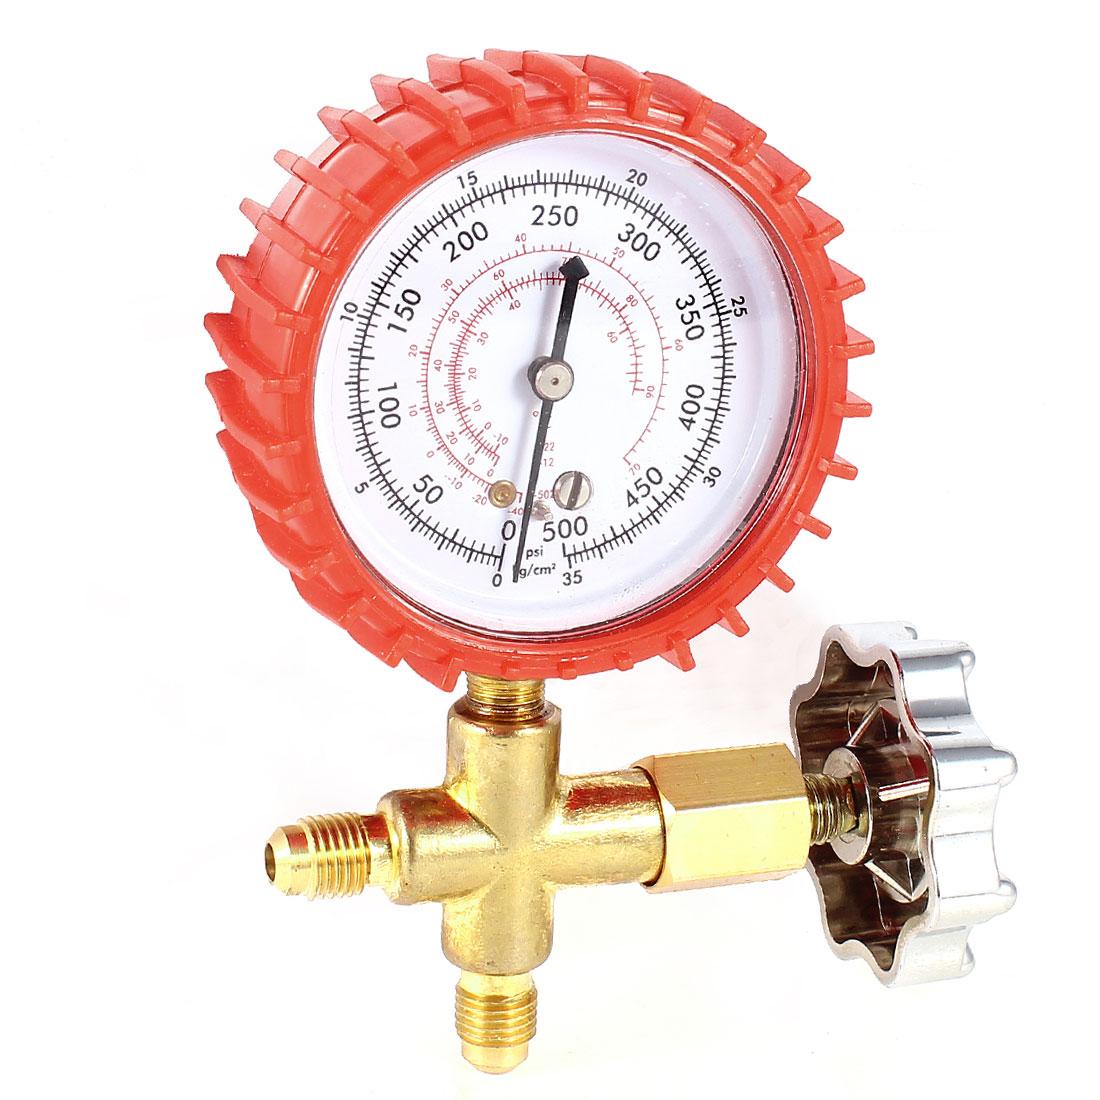 11mm Thread Air Conditioner Refrigeration Single Manifold Pressure Gauge Tool